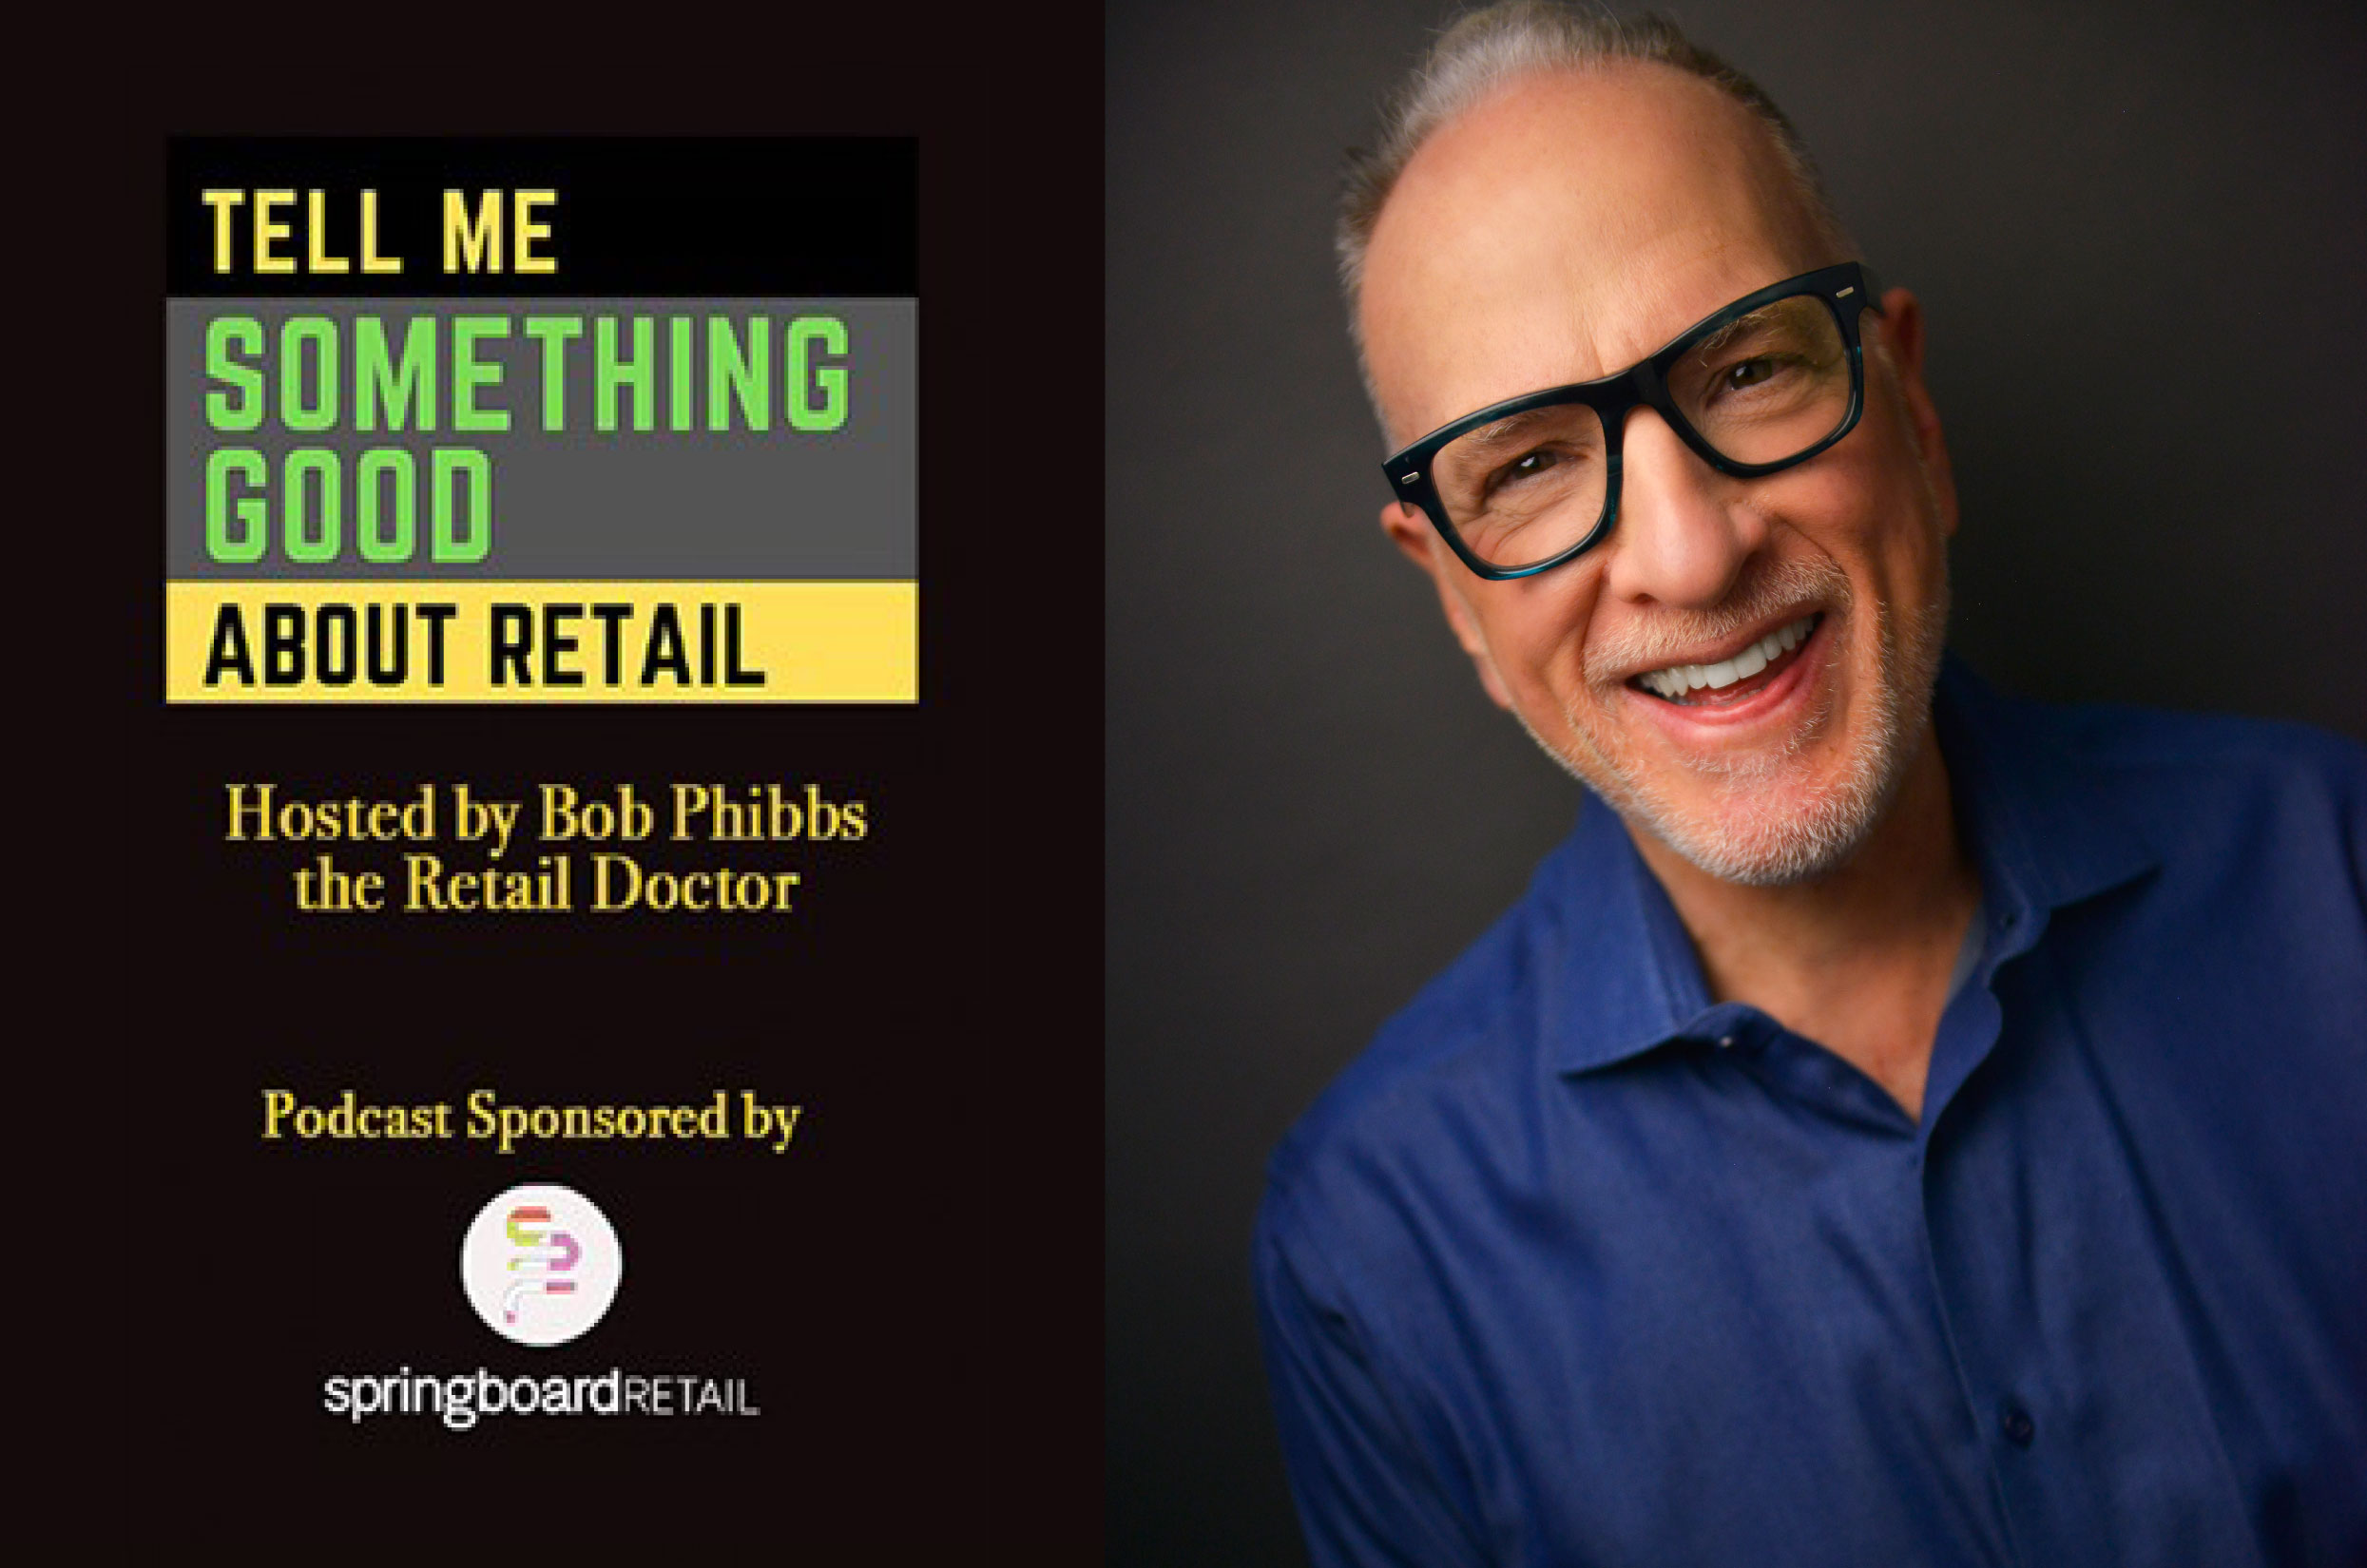 Retail Podcast 409: Richard Shapiro on Creating Human Connection